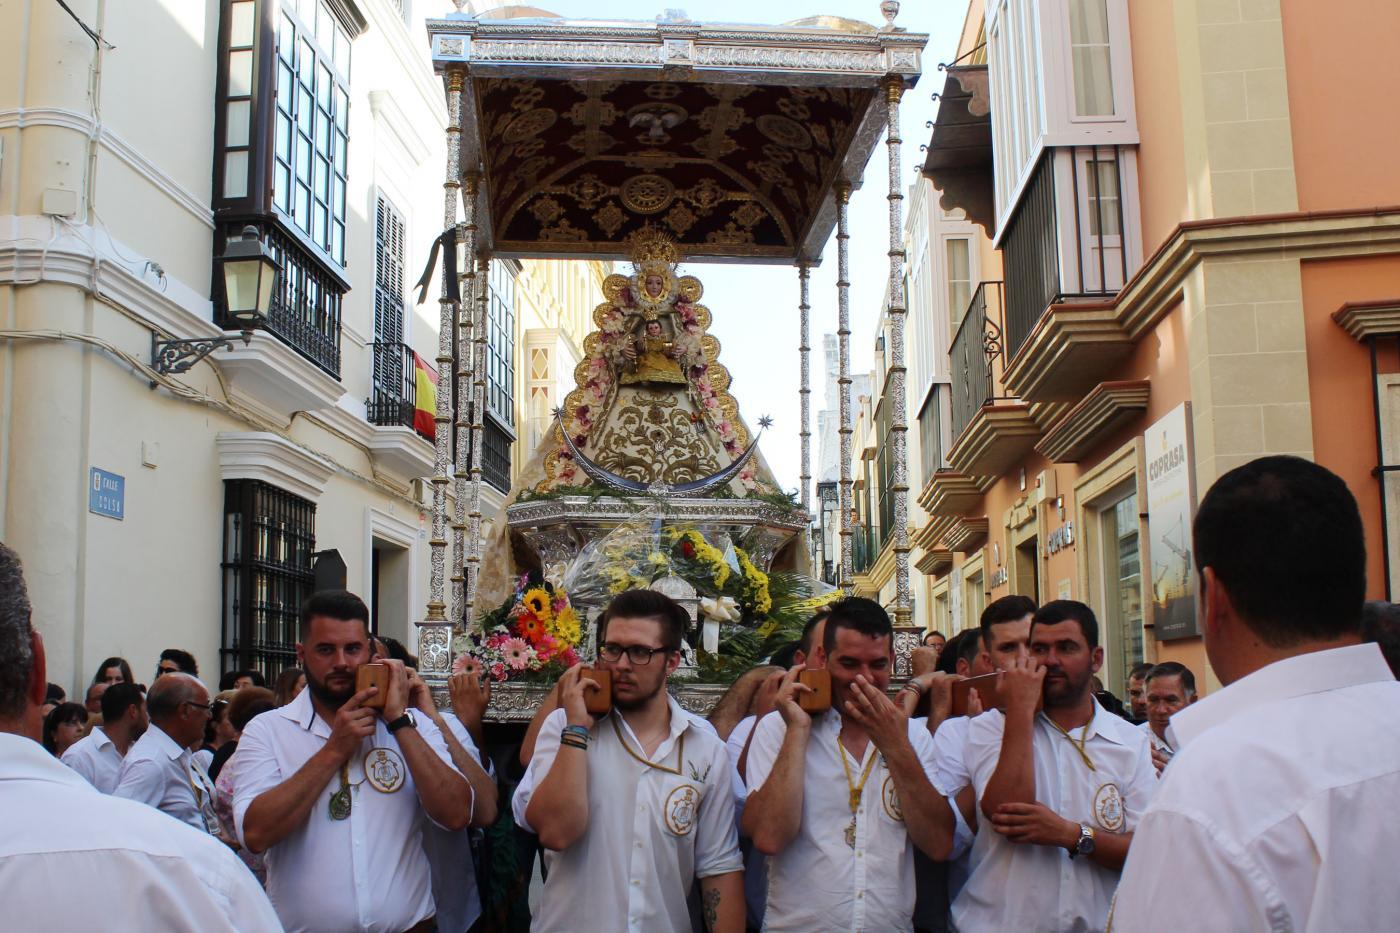 Июнь. День Богородицы (Virgen del Rocío)